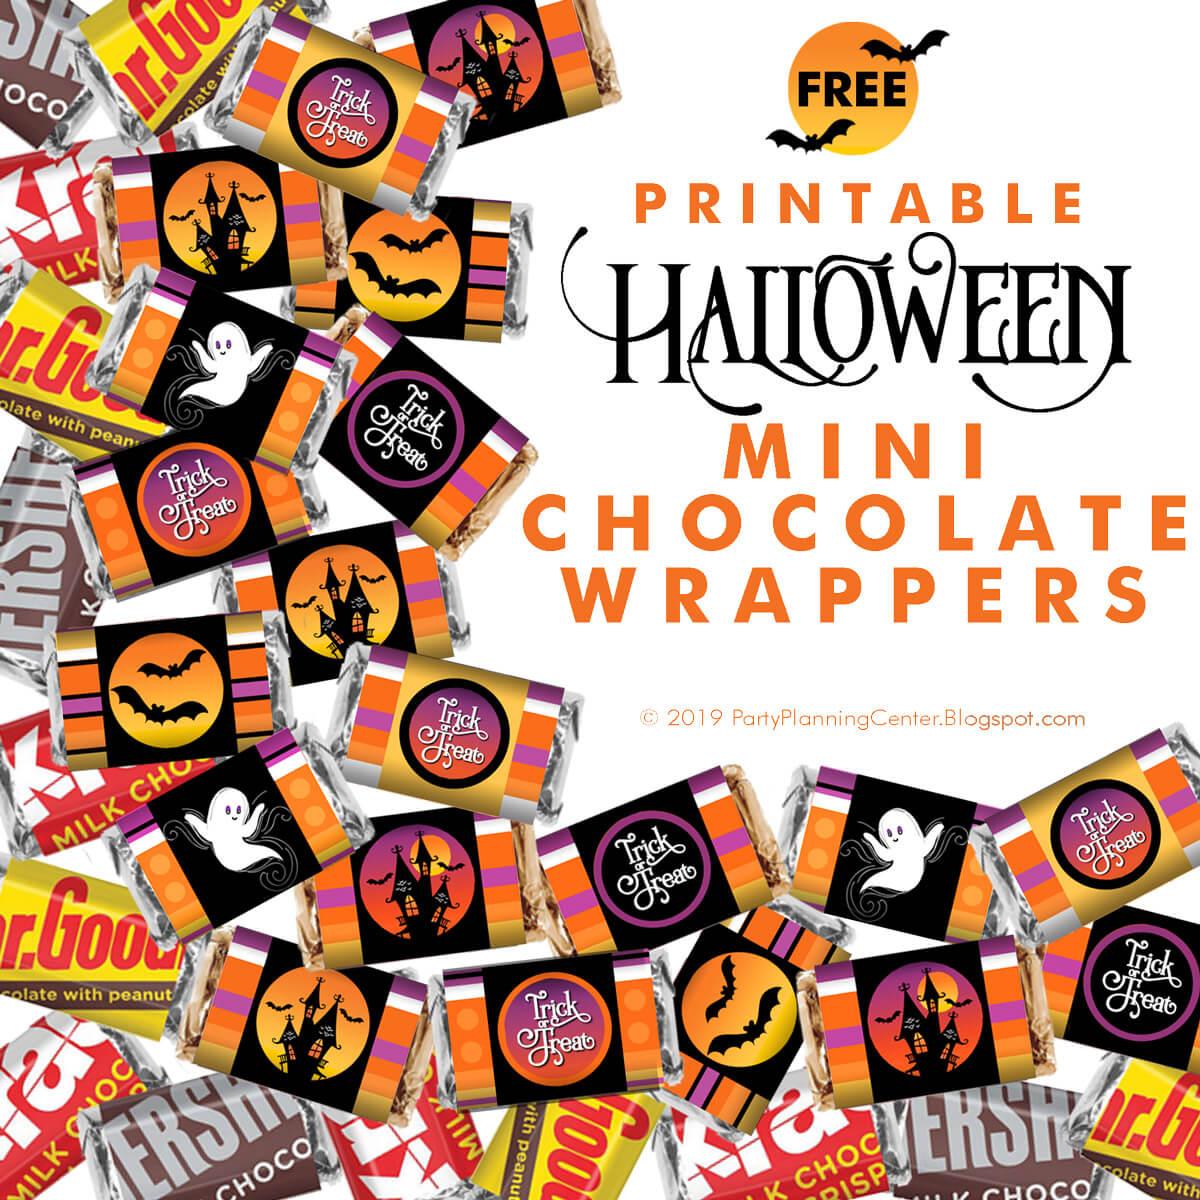 FREE Printable Halloween Mini Hershey Chocolate Bar Wrappers #hersheywrappers #hersheyprintables #minihershey